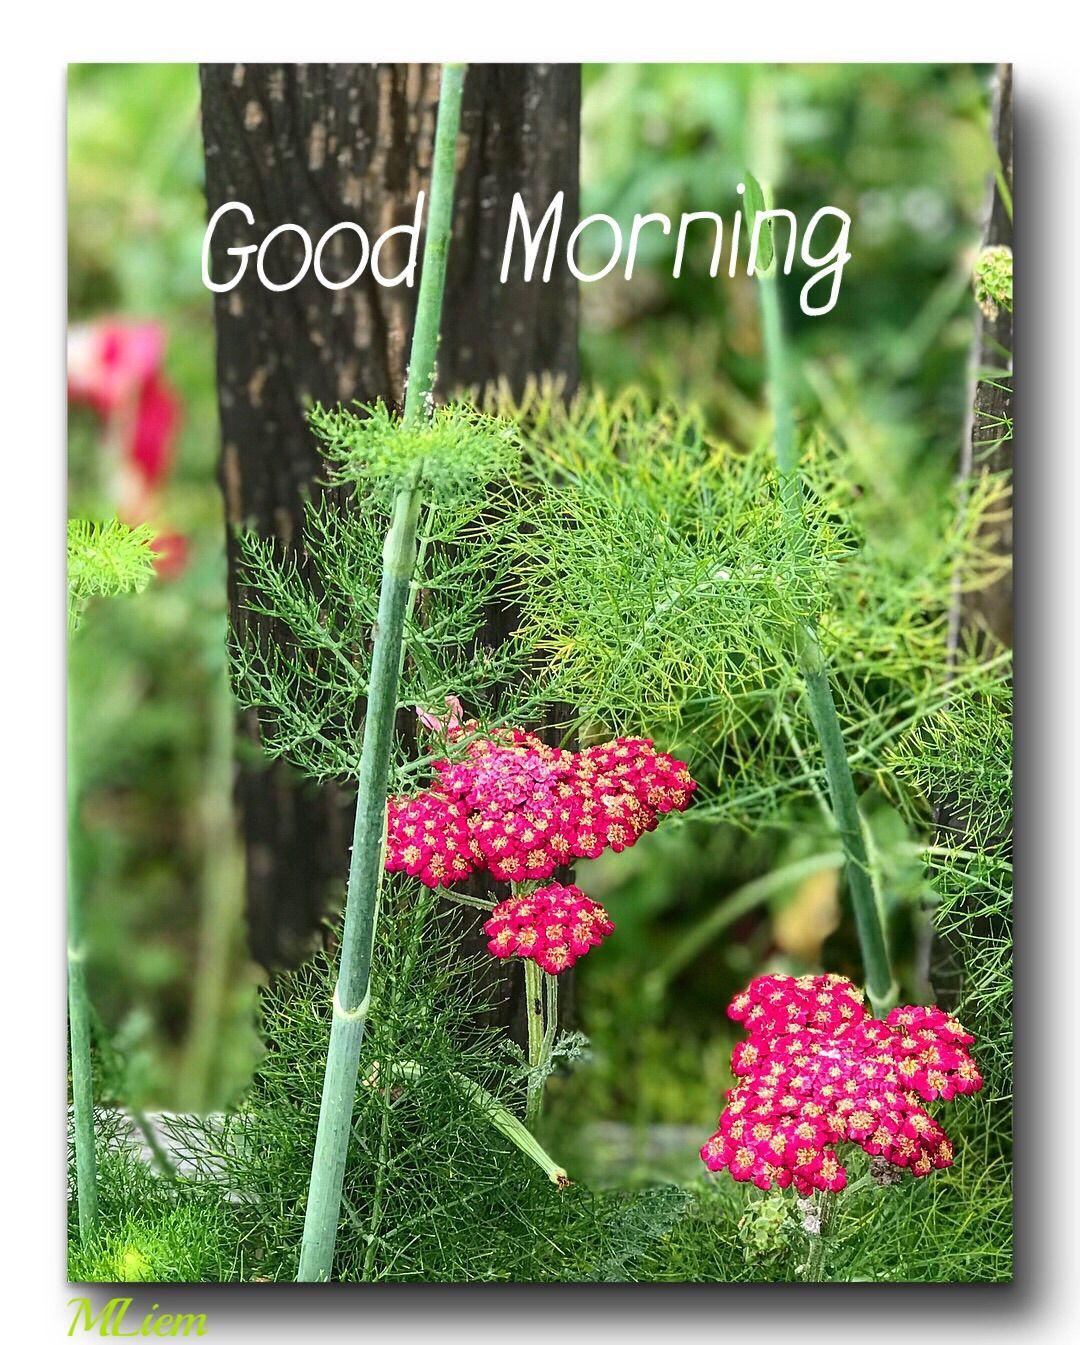 Pin by Fakhruddin Jiwakhan on Greetings in English. Good